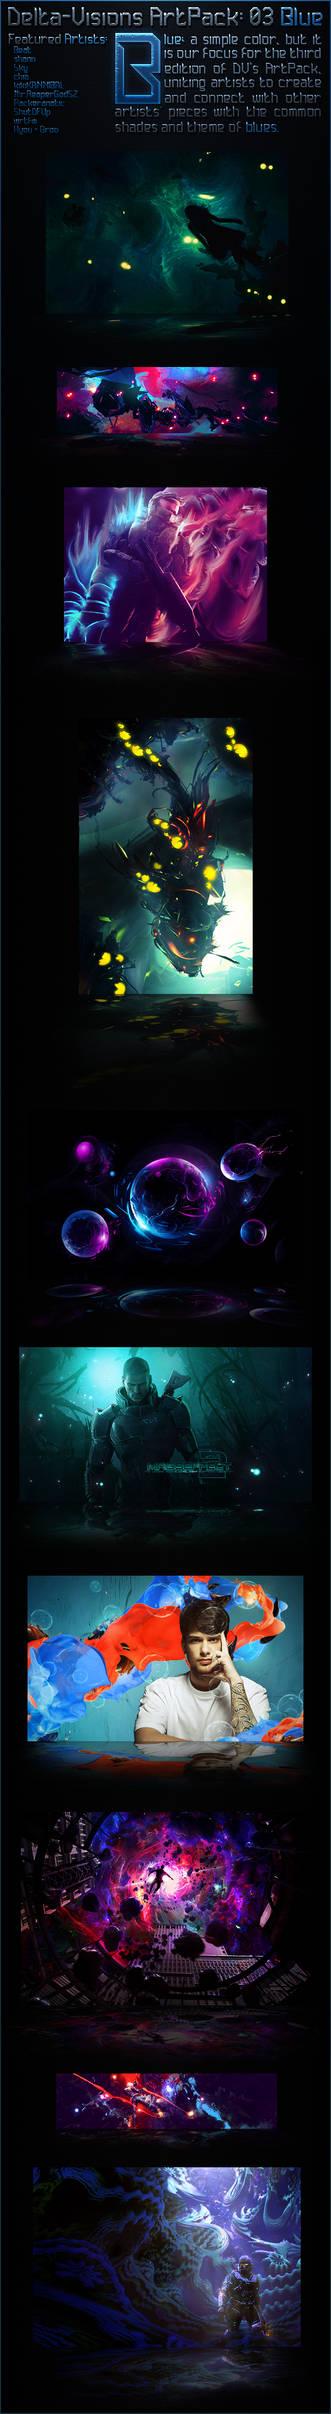 Delta-Visions ArtPack 3 by Delta-Visions